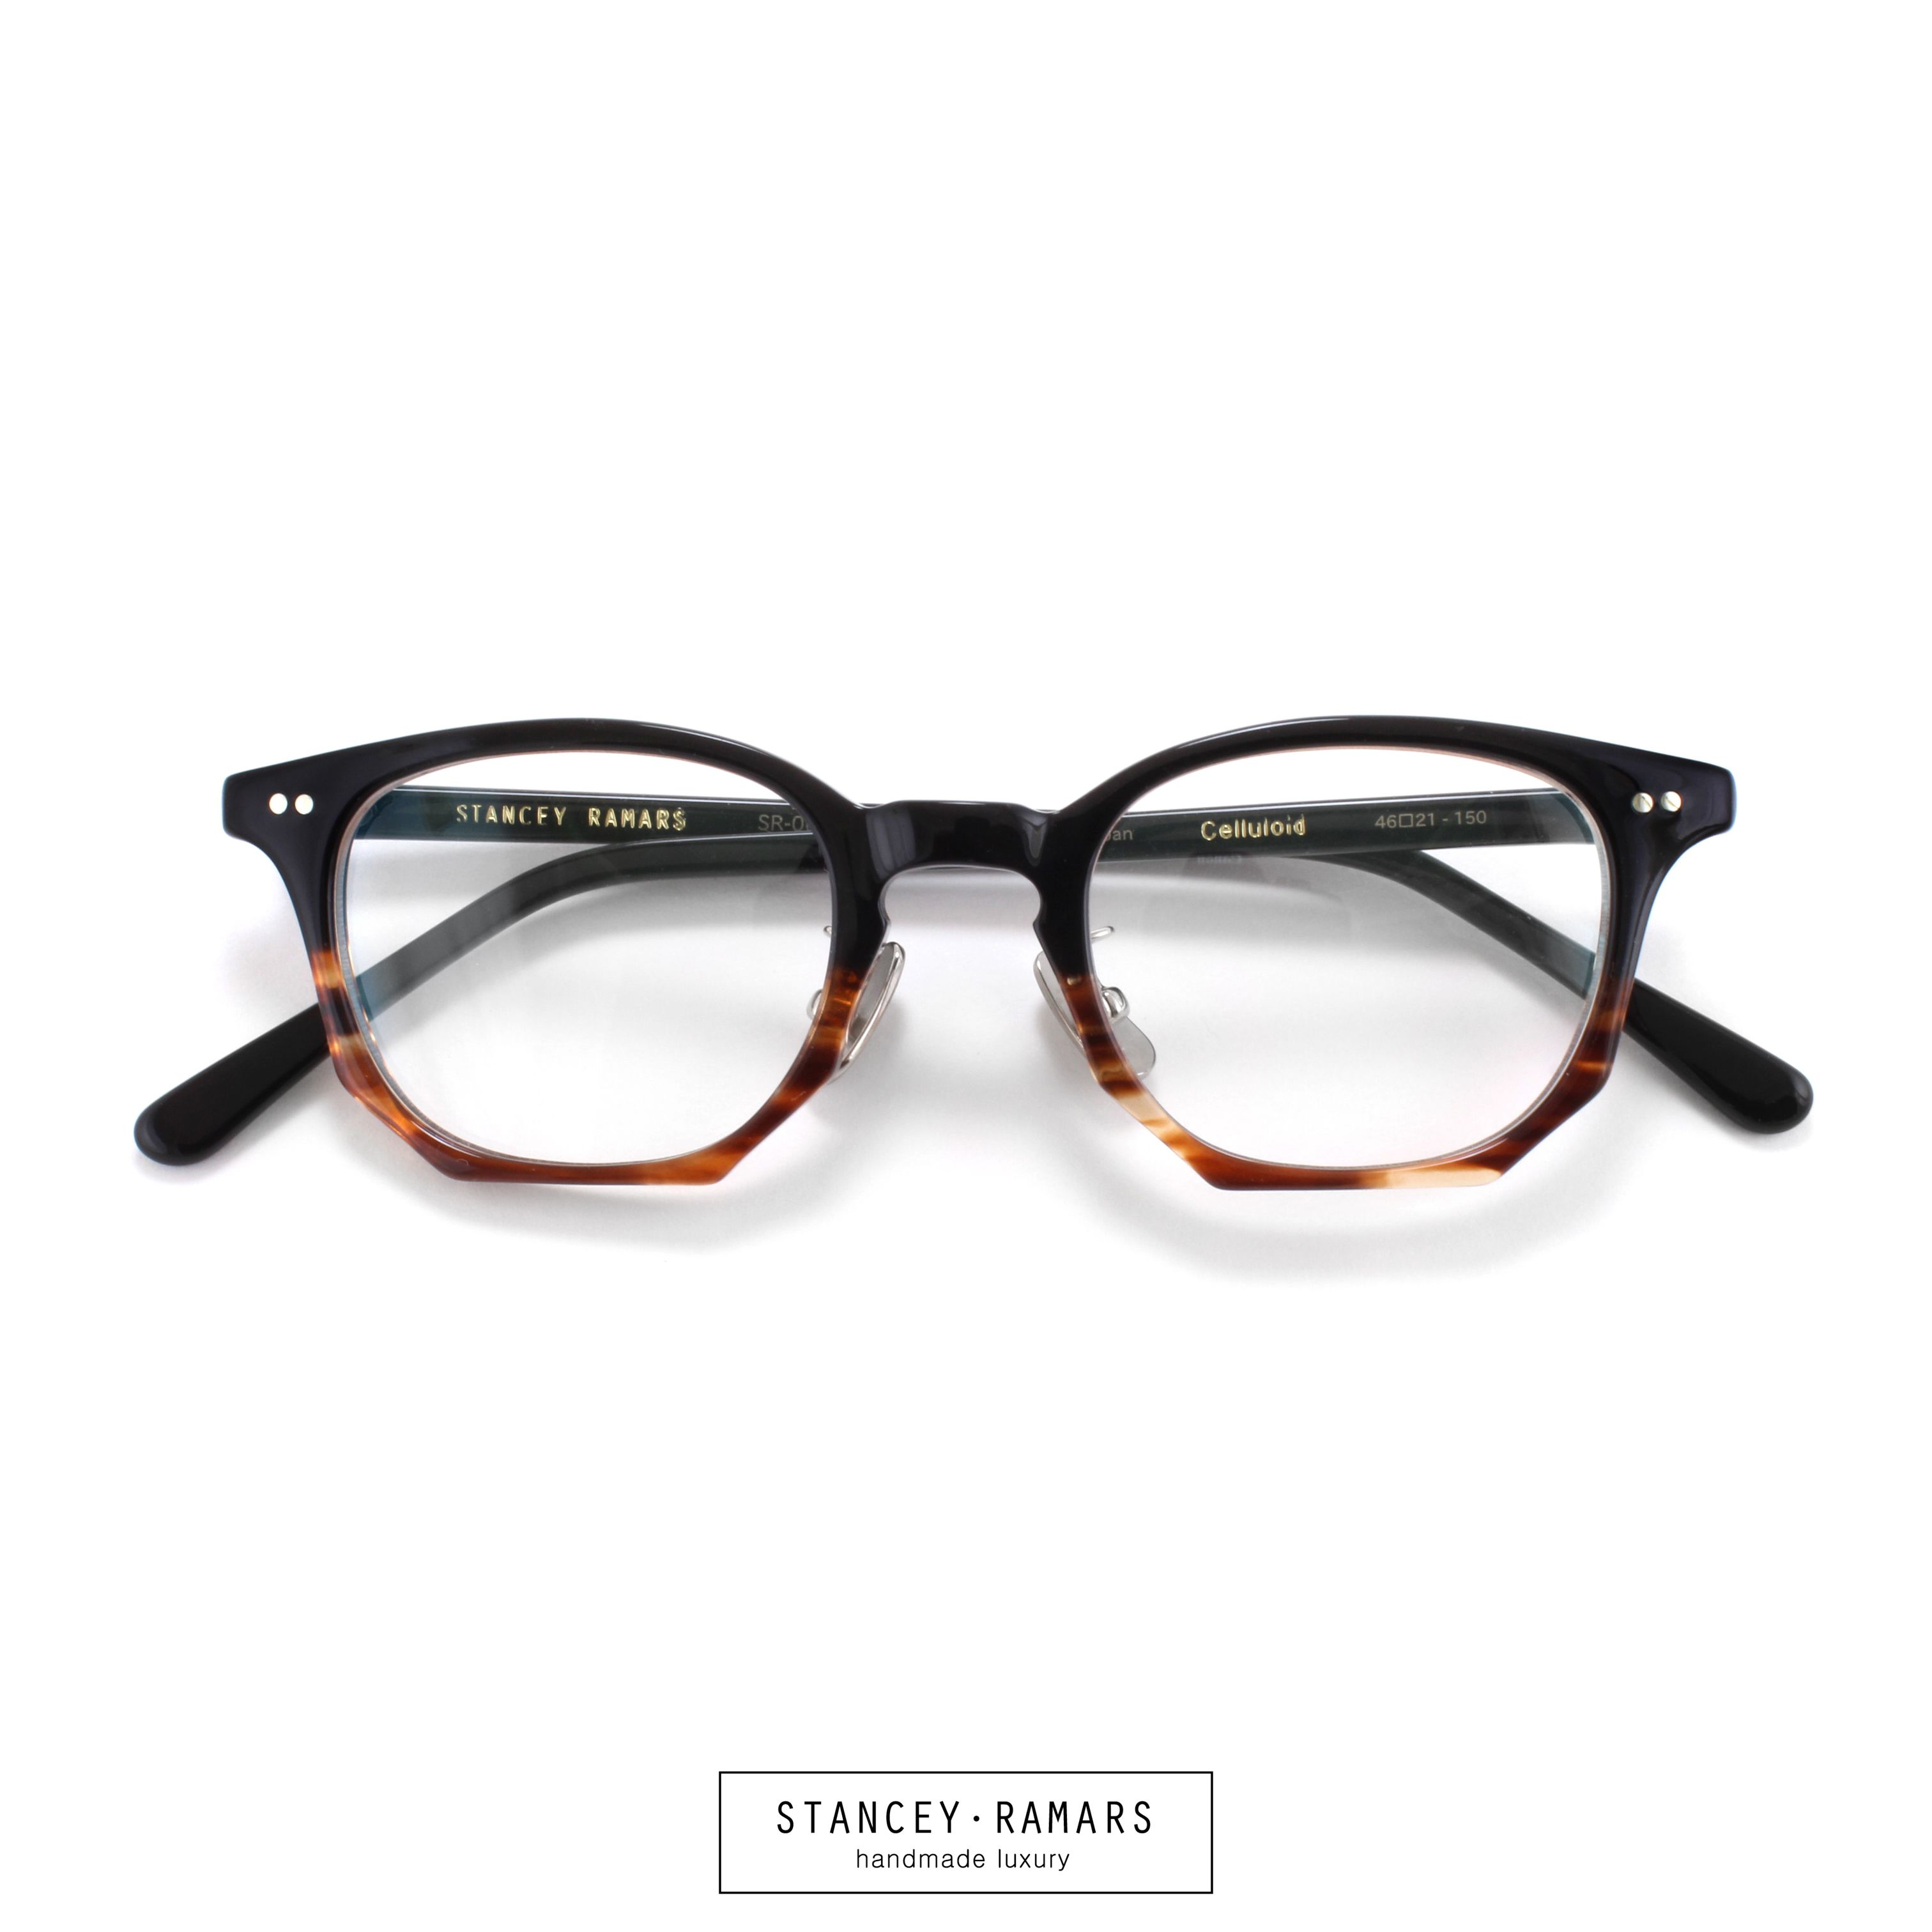 c60d018faad The Stancey Ramars Eyeglasses